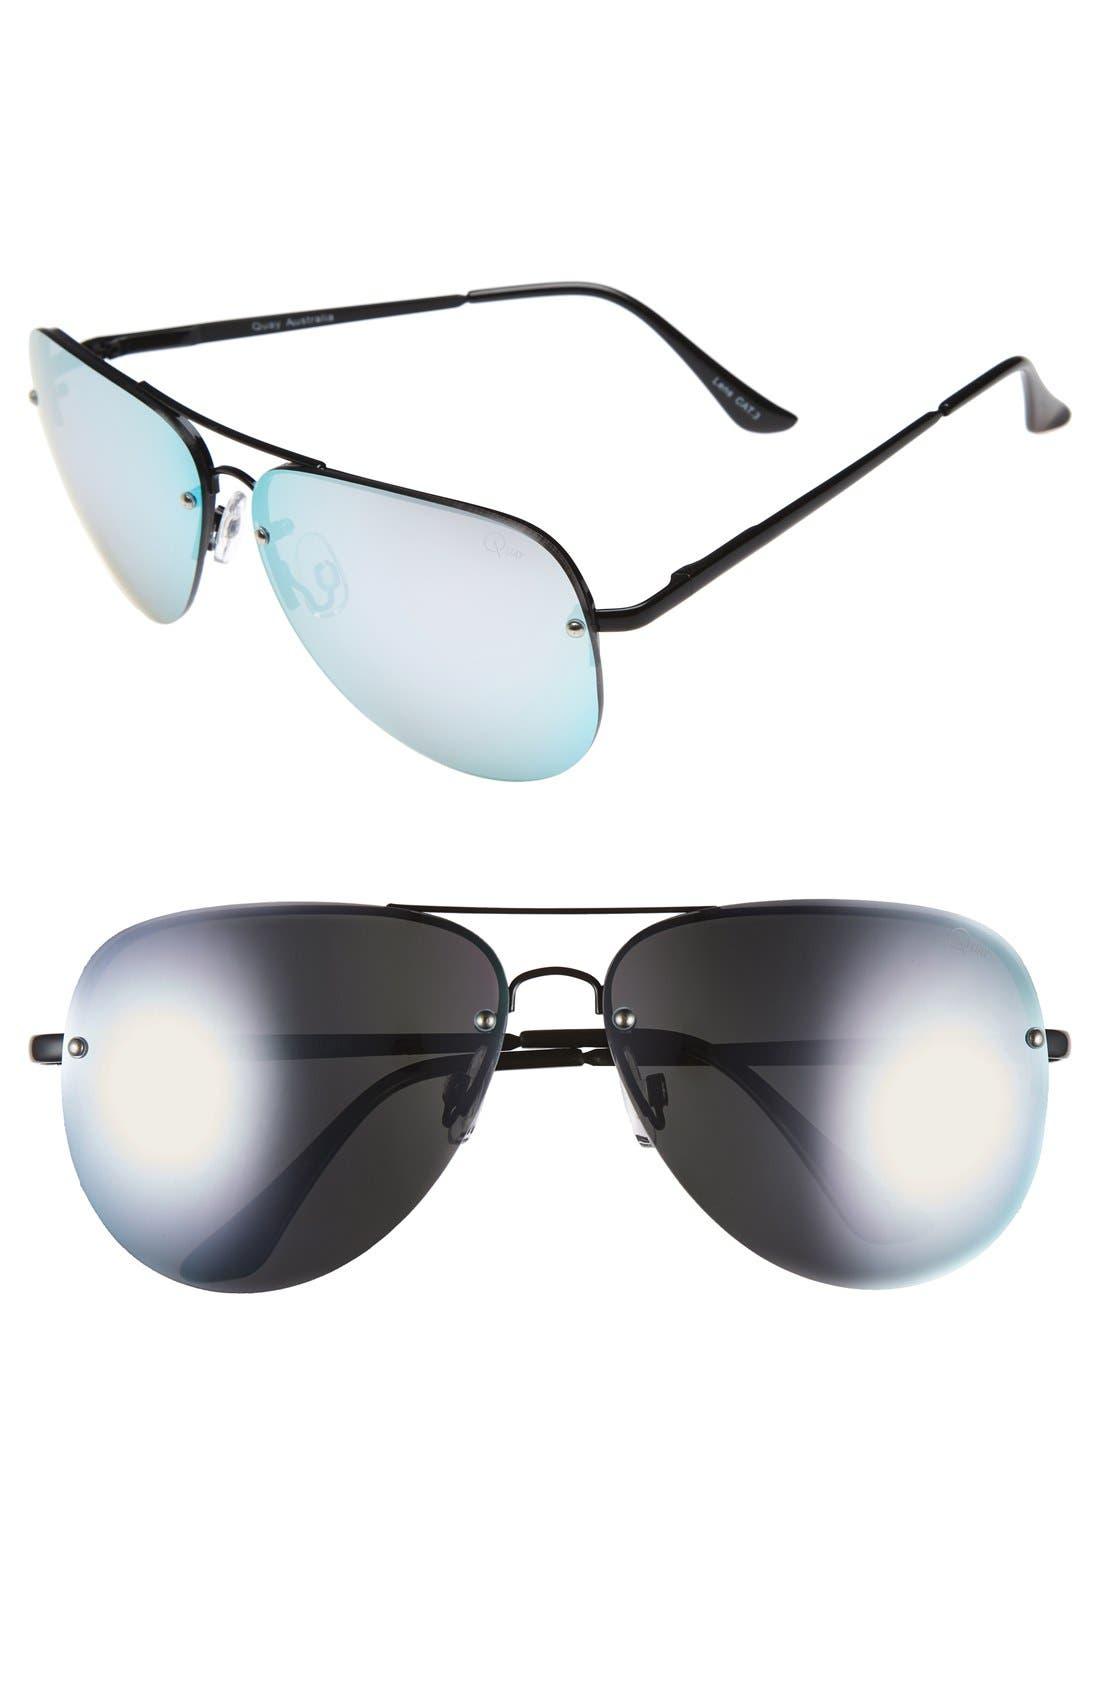 'Muse' 65mm Mirrored Aviator Sunglasses,                             Main thumbnail 1, color,                             001